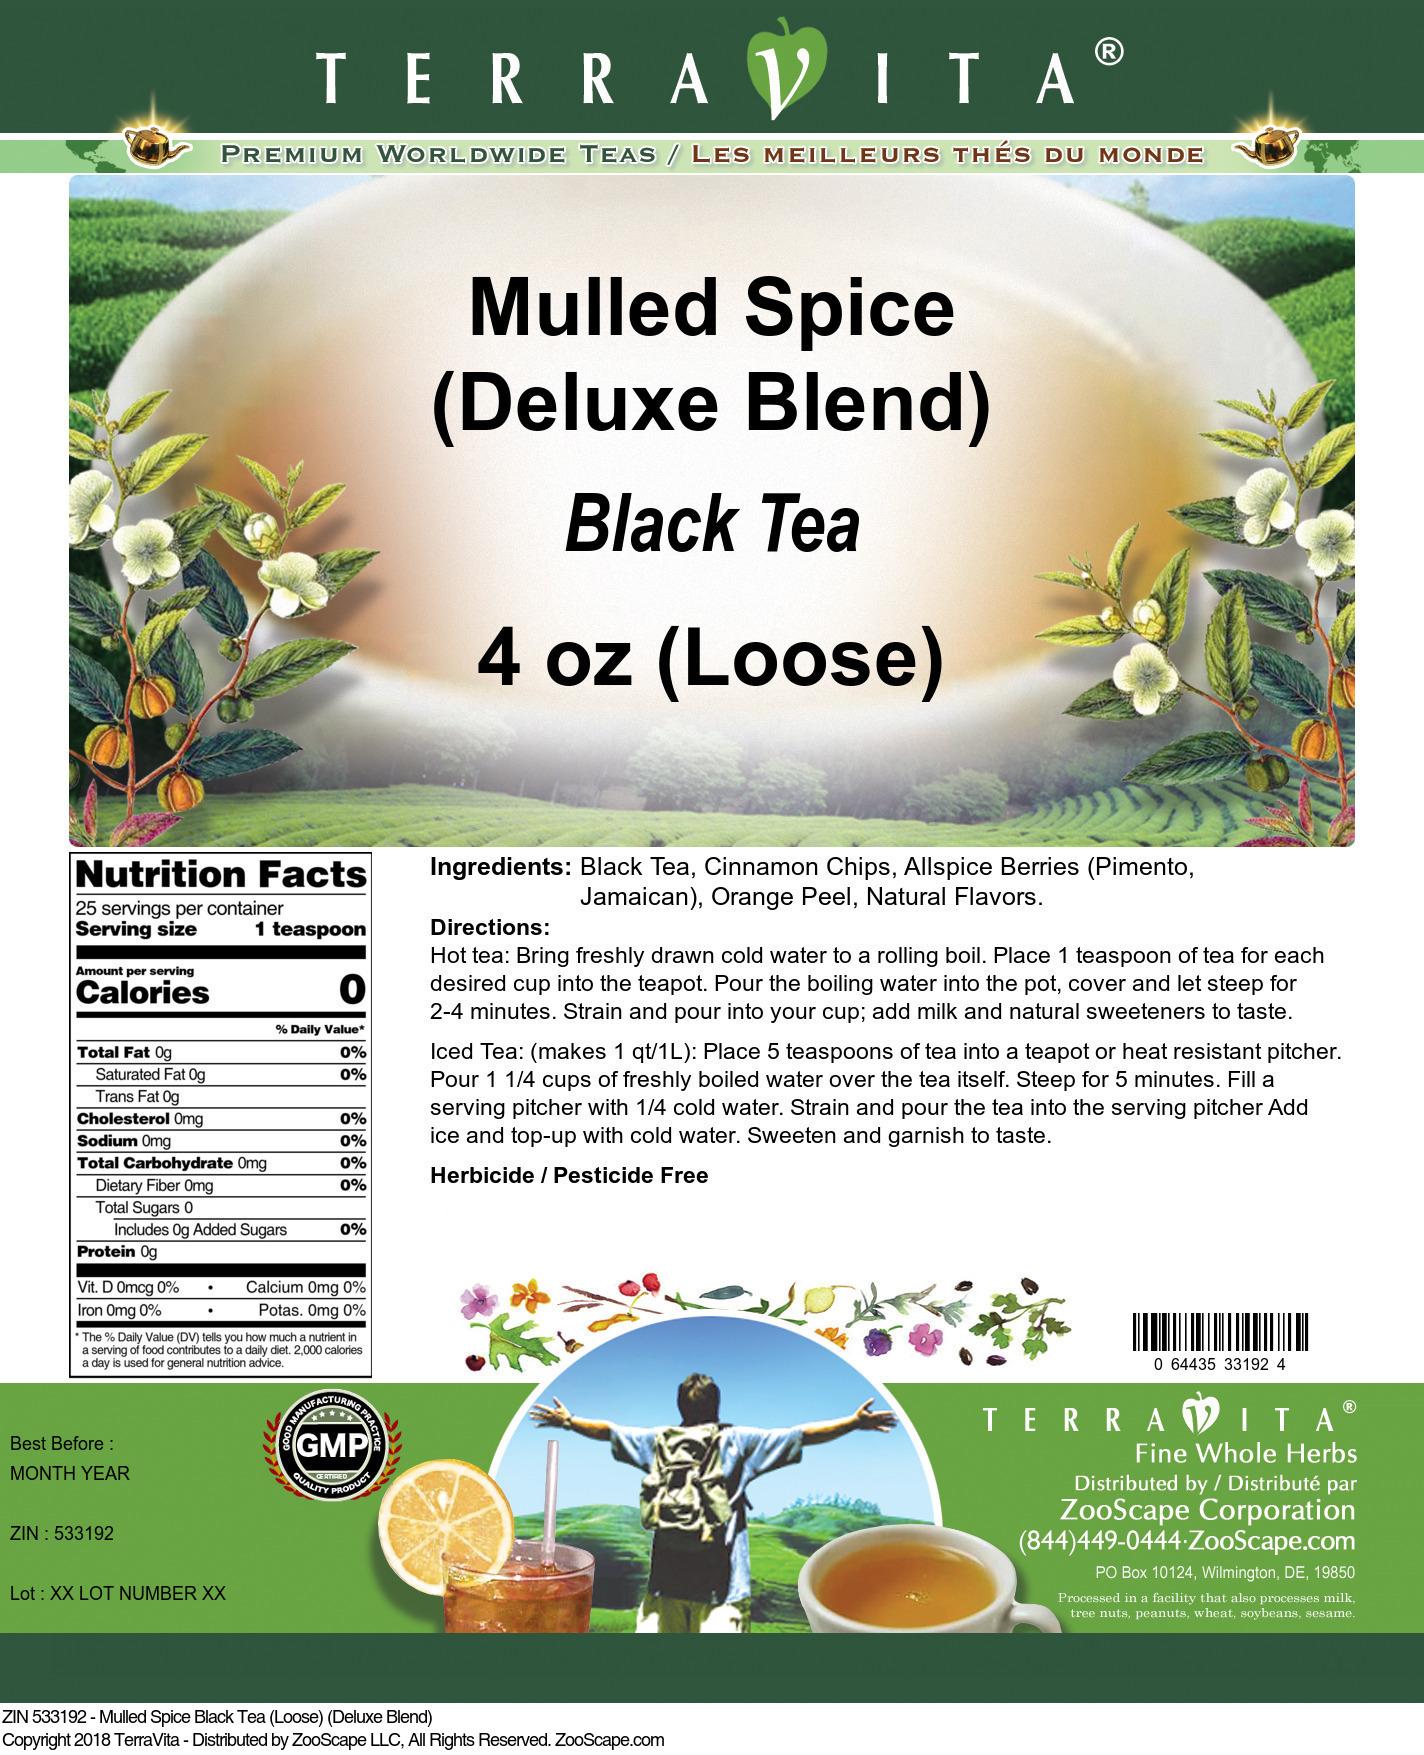 Mulled Spice Black Tea (Loose) (Deluxe Blend)